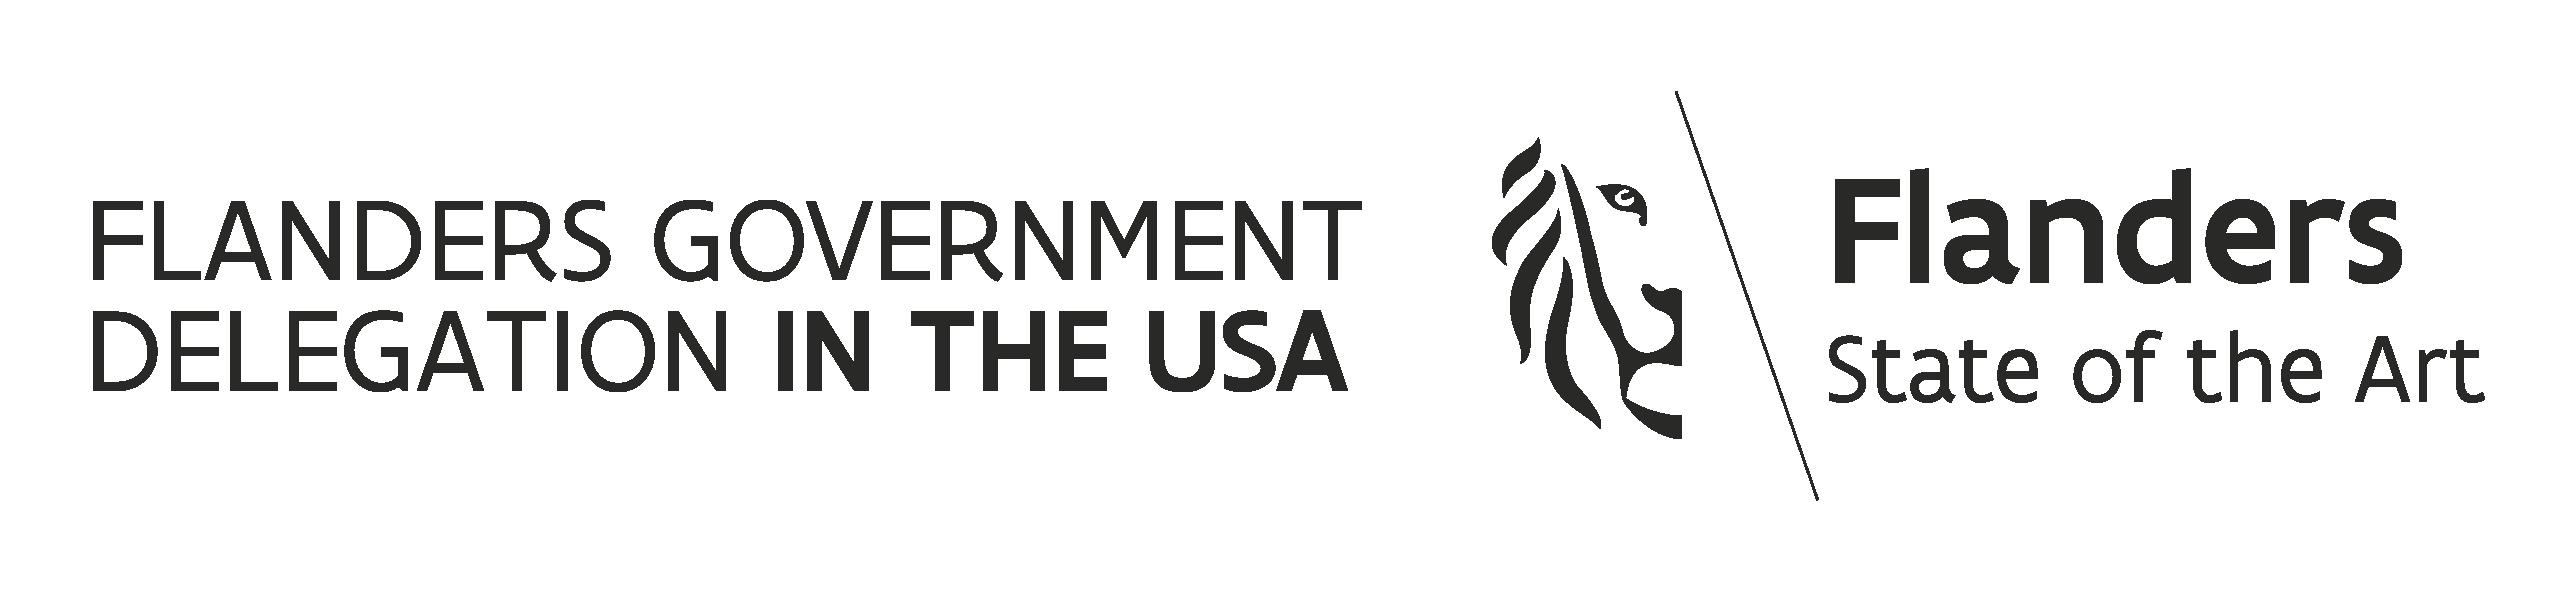 in-left-horizontal-combi-logo